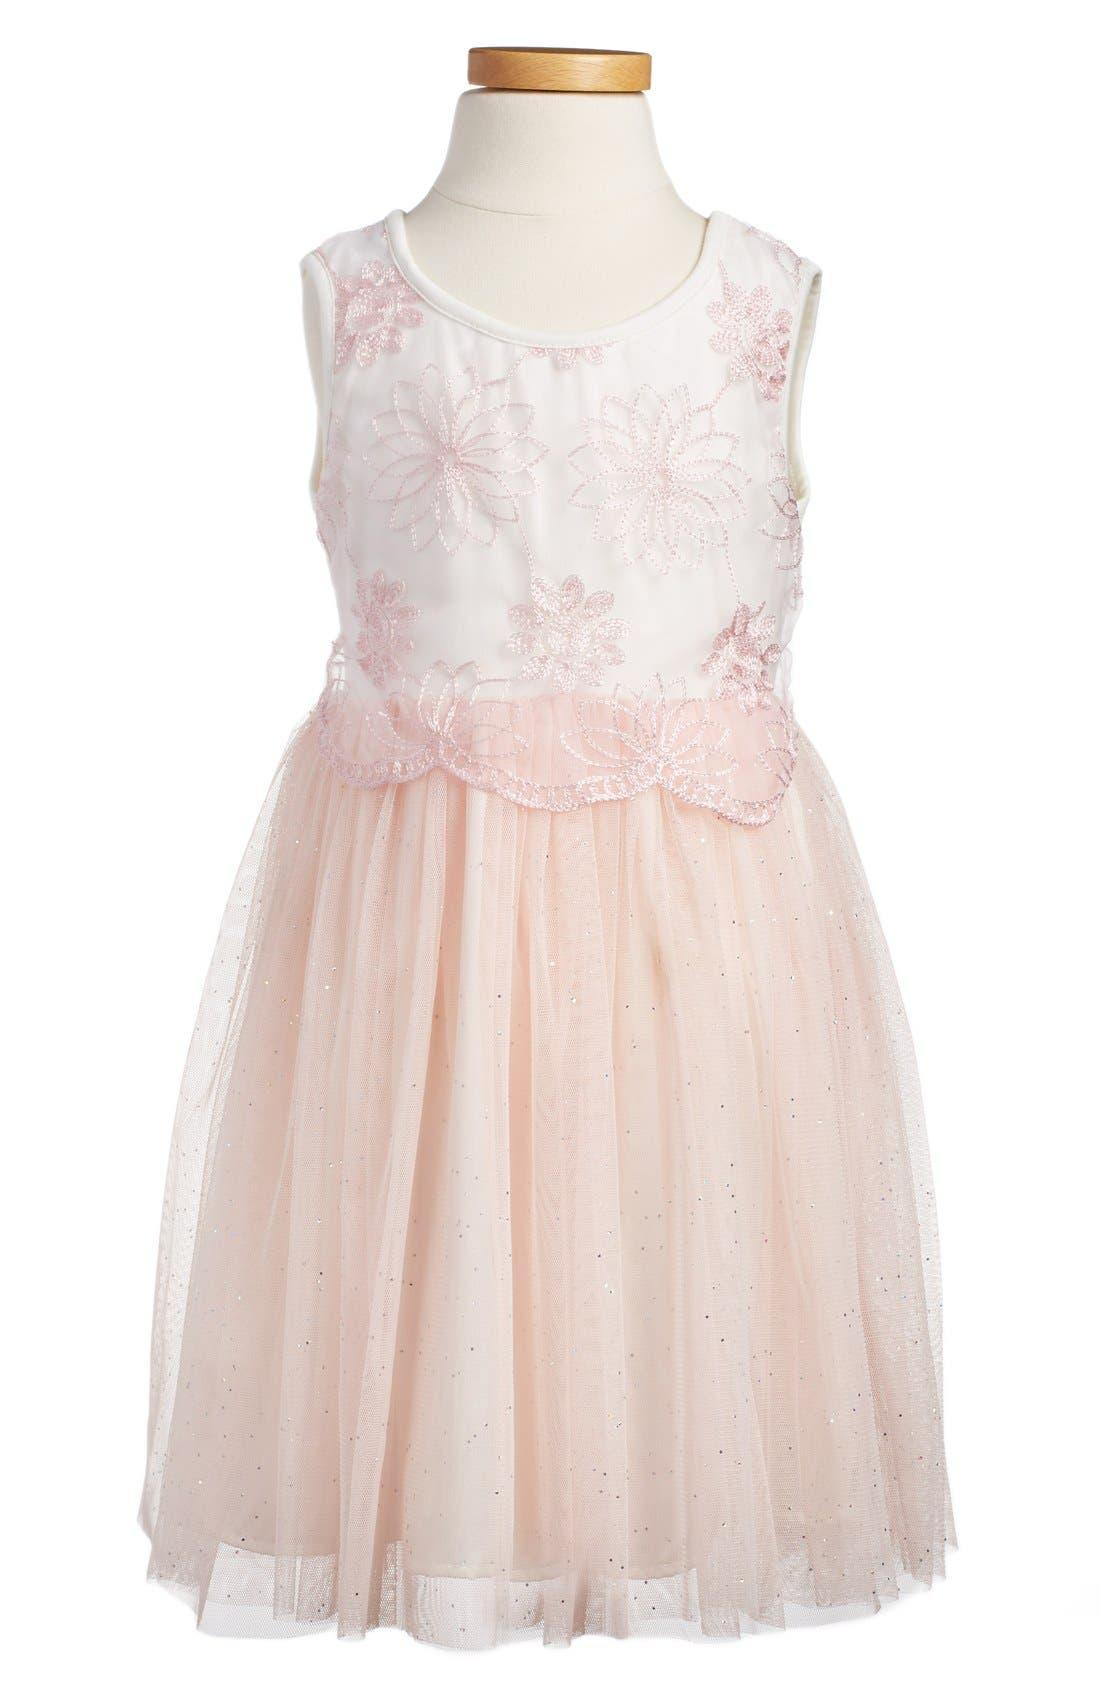 POPATU, Embroidered Tulle Dress, Main thumbnail 1, color, PEACH